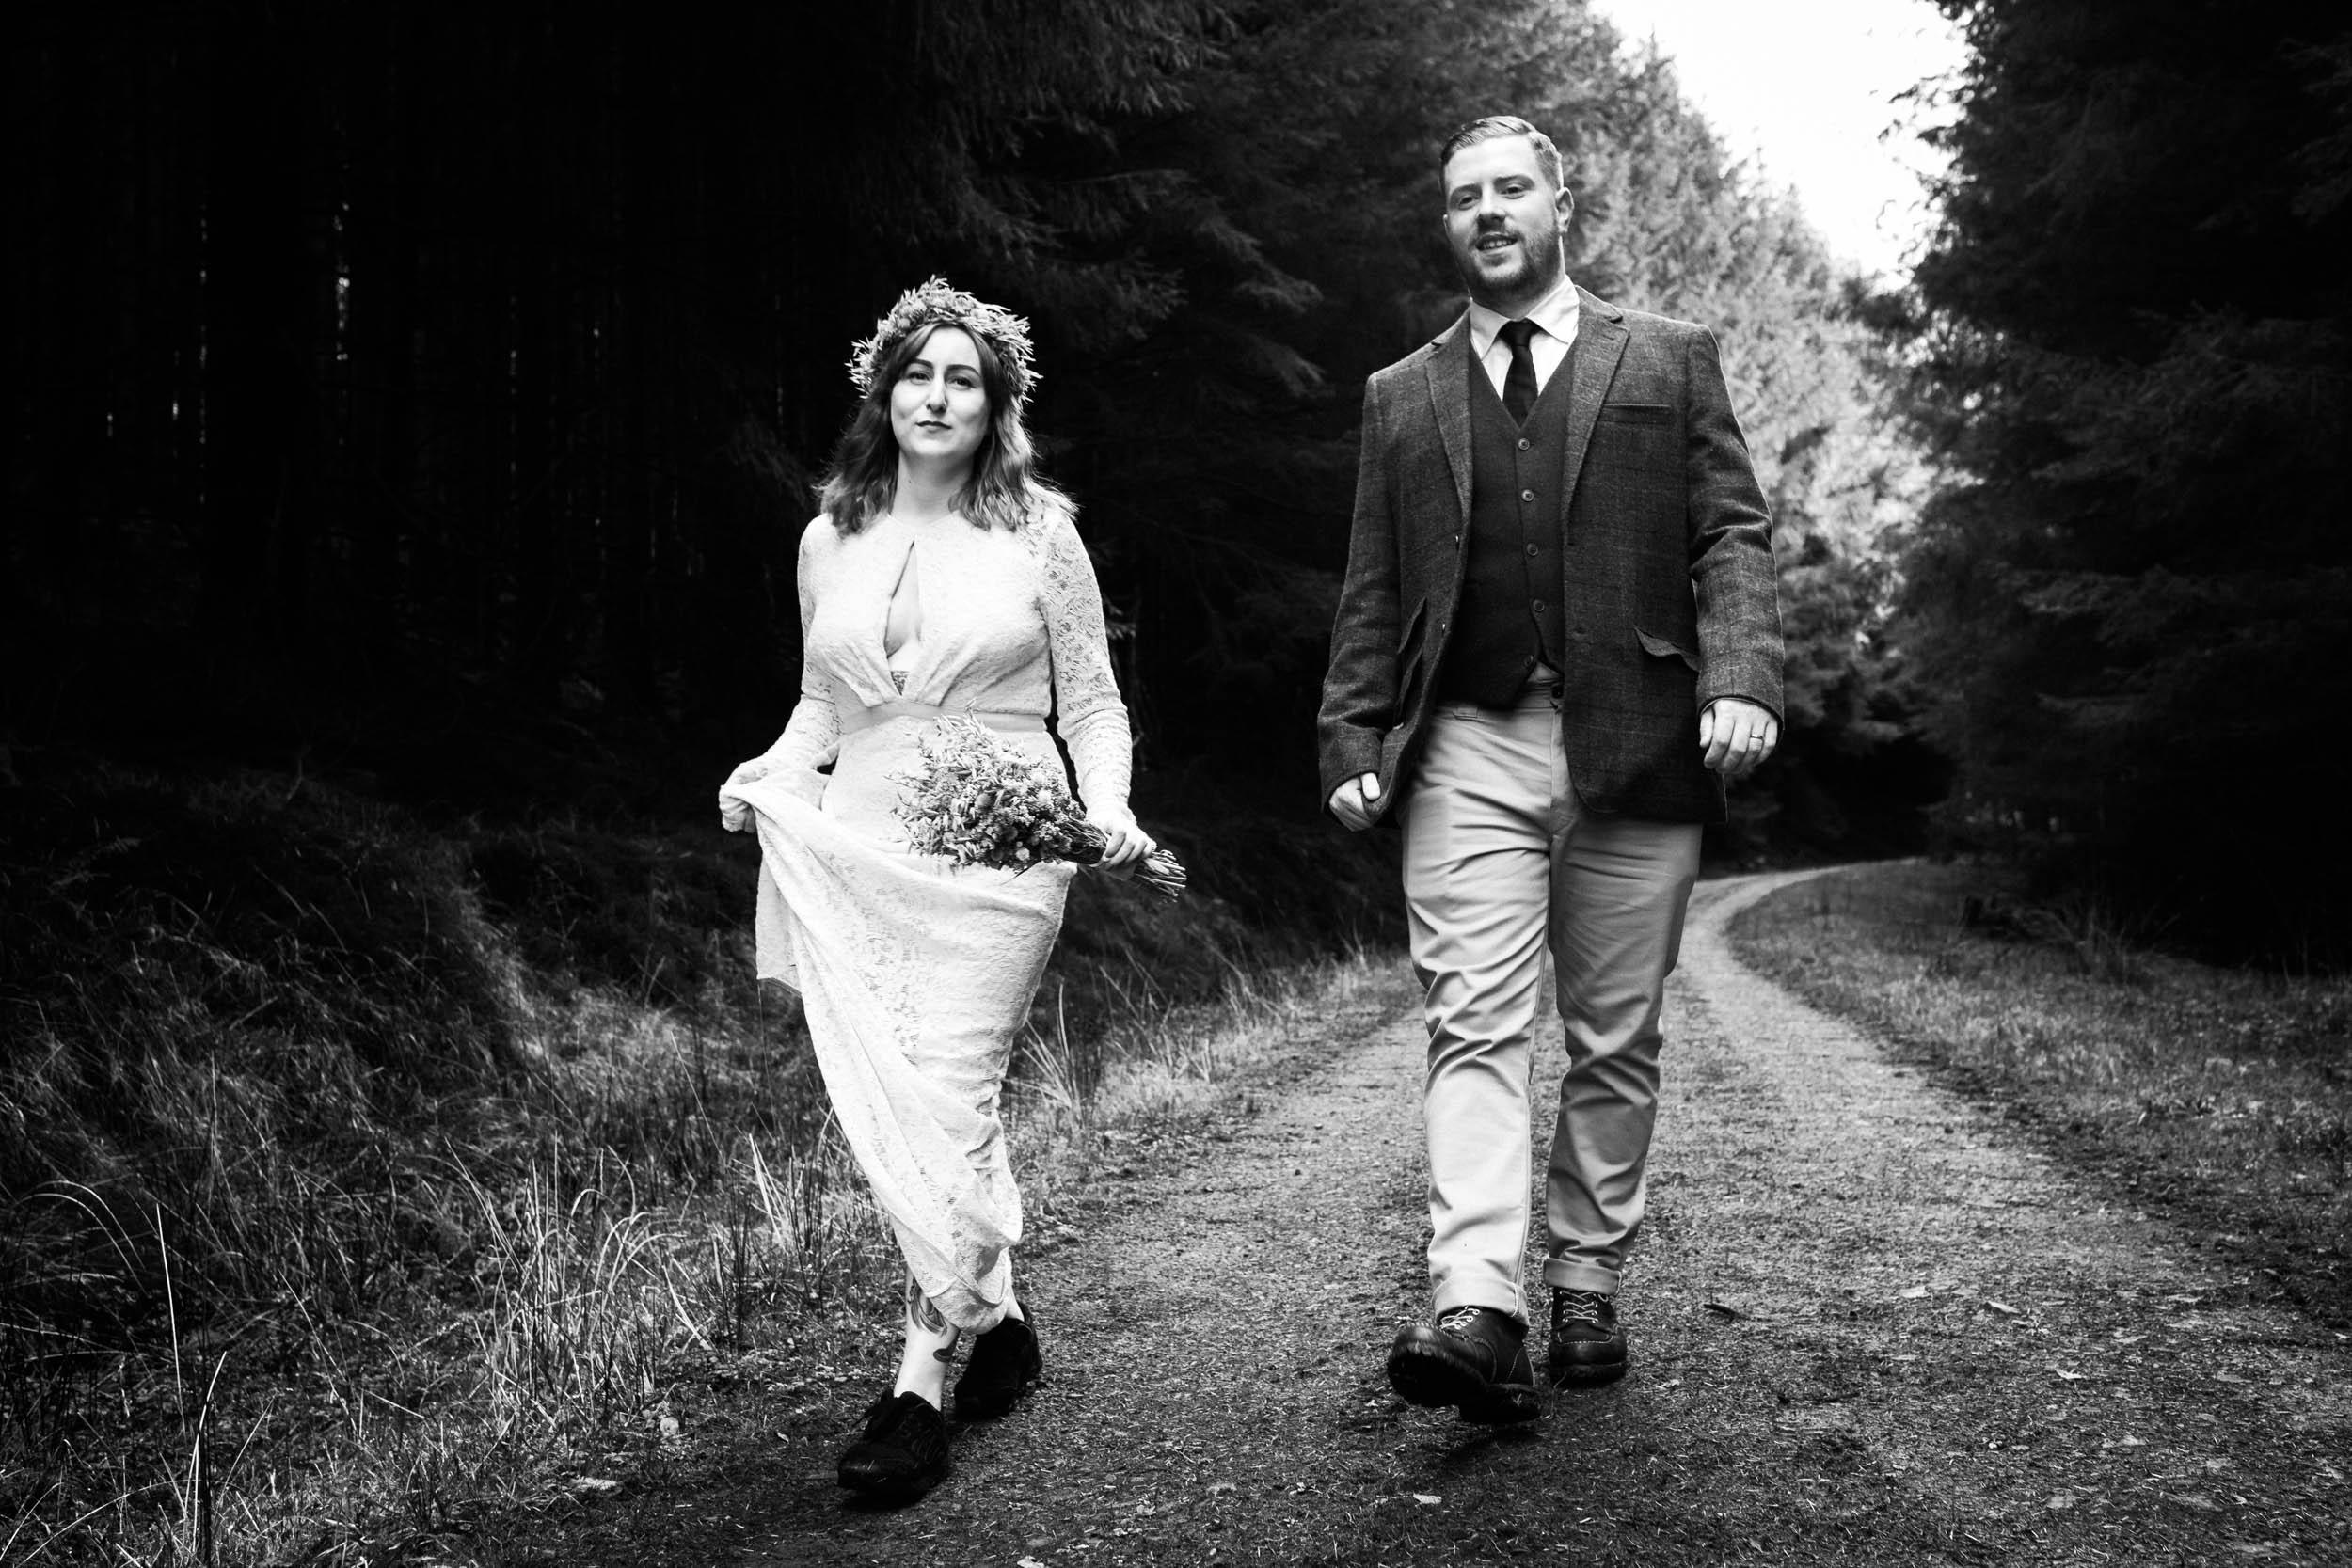 Alex_Sedgmond_Photography-SouthWalesWeddingPhotography-Wedding-Photographer-Cardiff-71.jpg